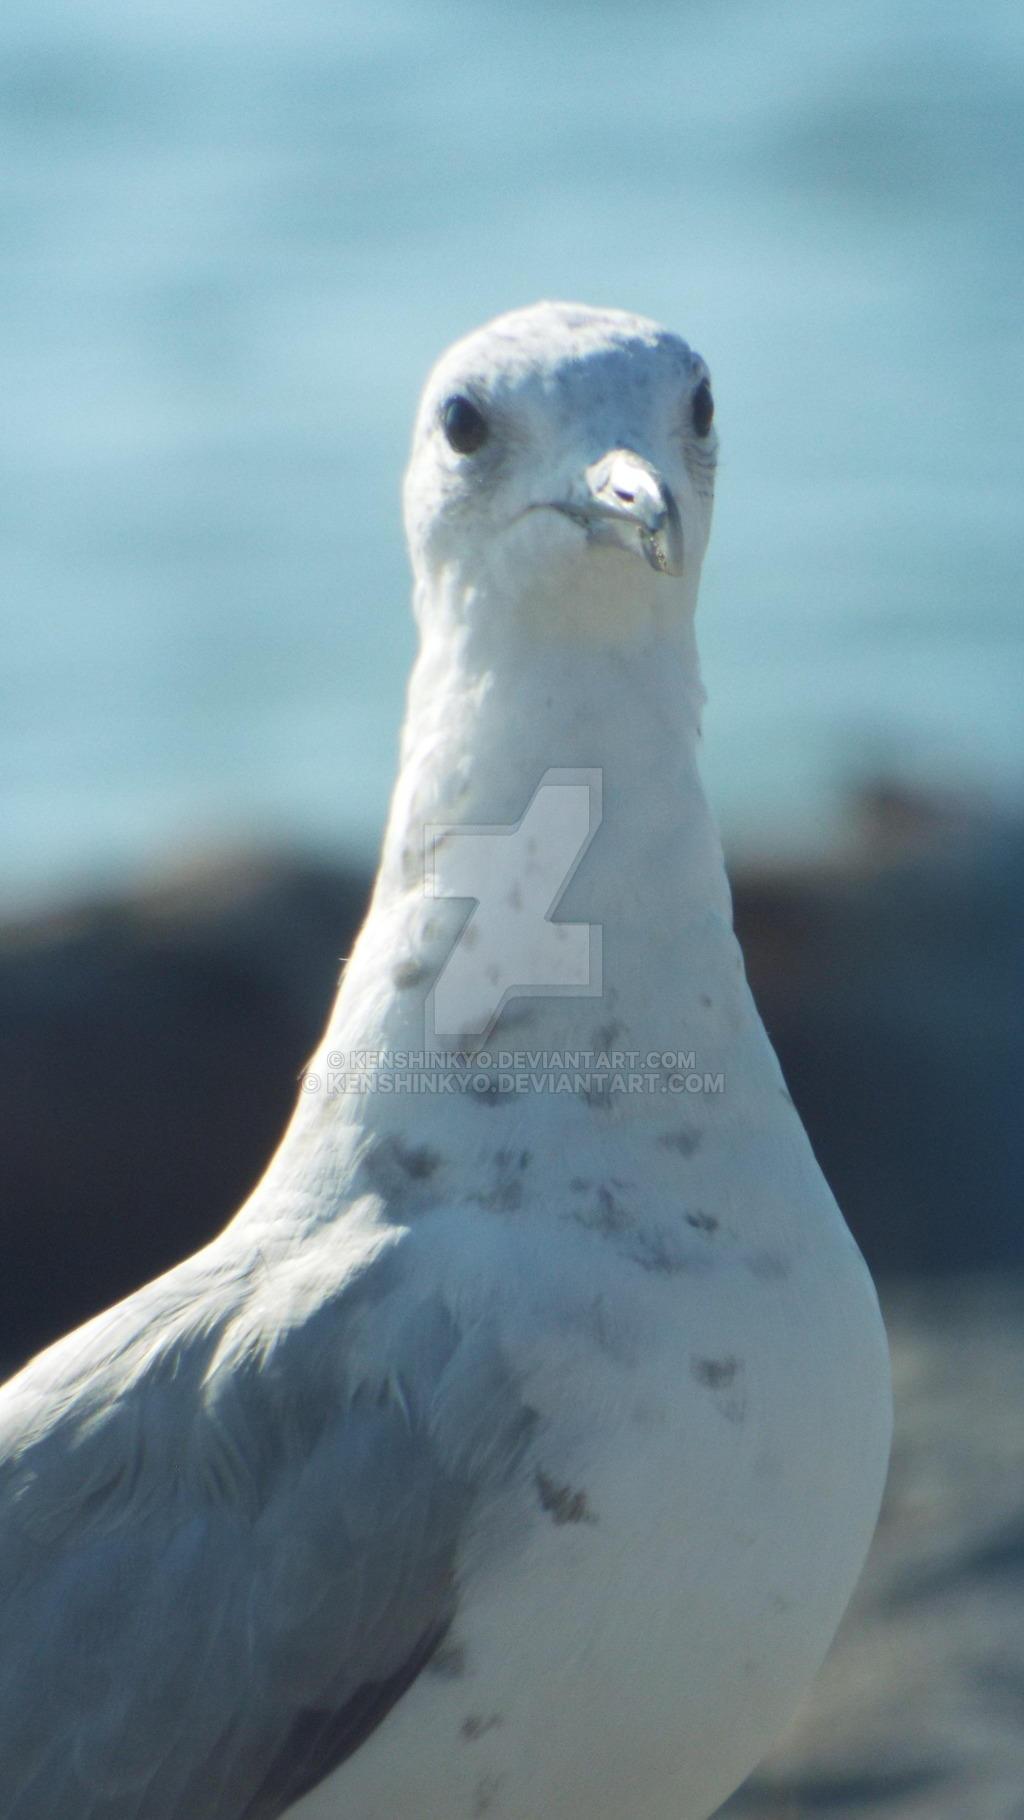 Seagull a by KenshinKyo